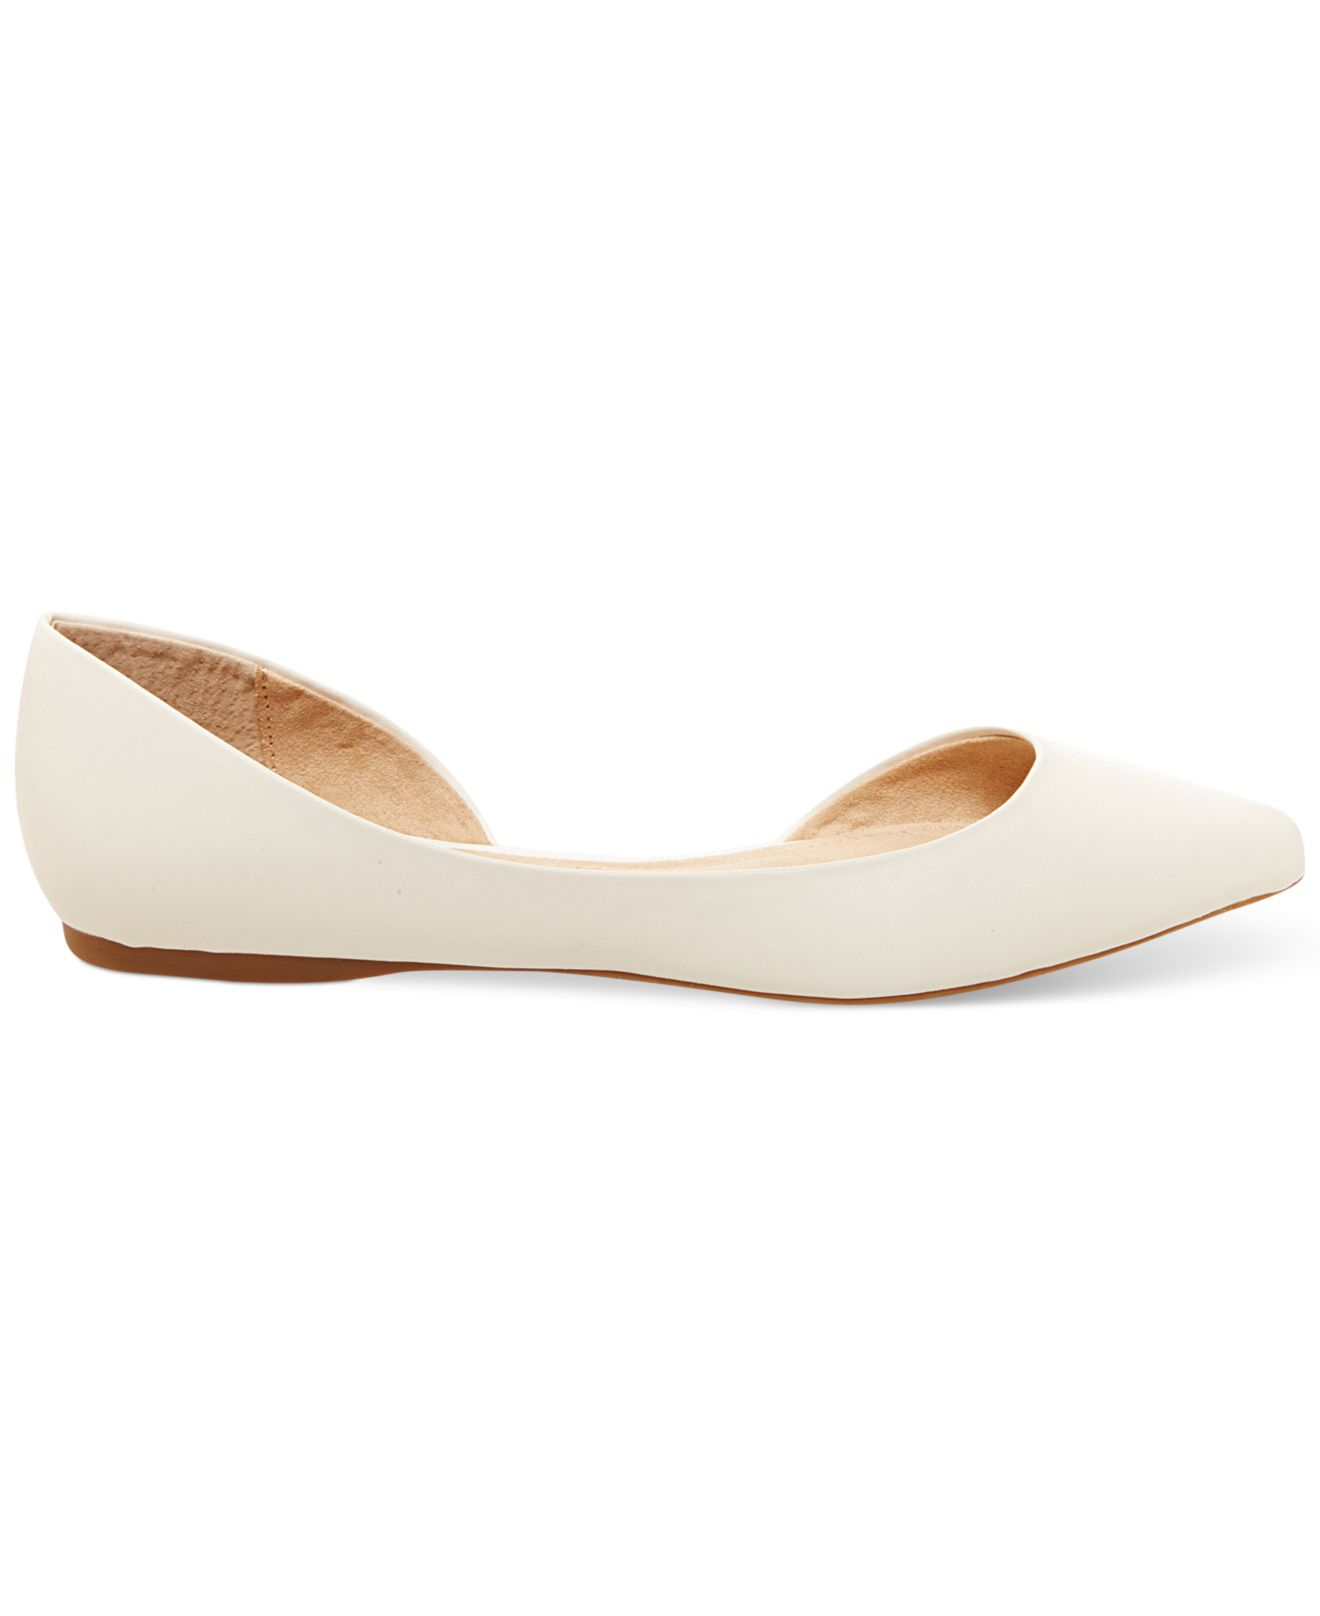 1c1bc970edf Steve Madden White Women'S Elusion D'Orsay Flats